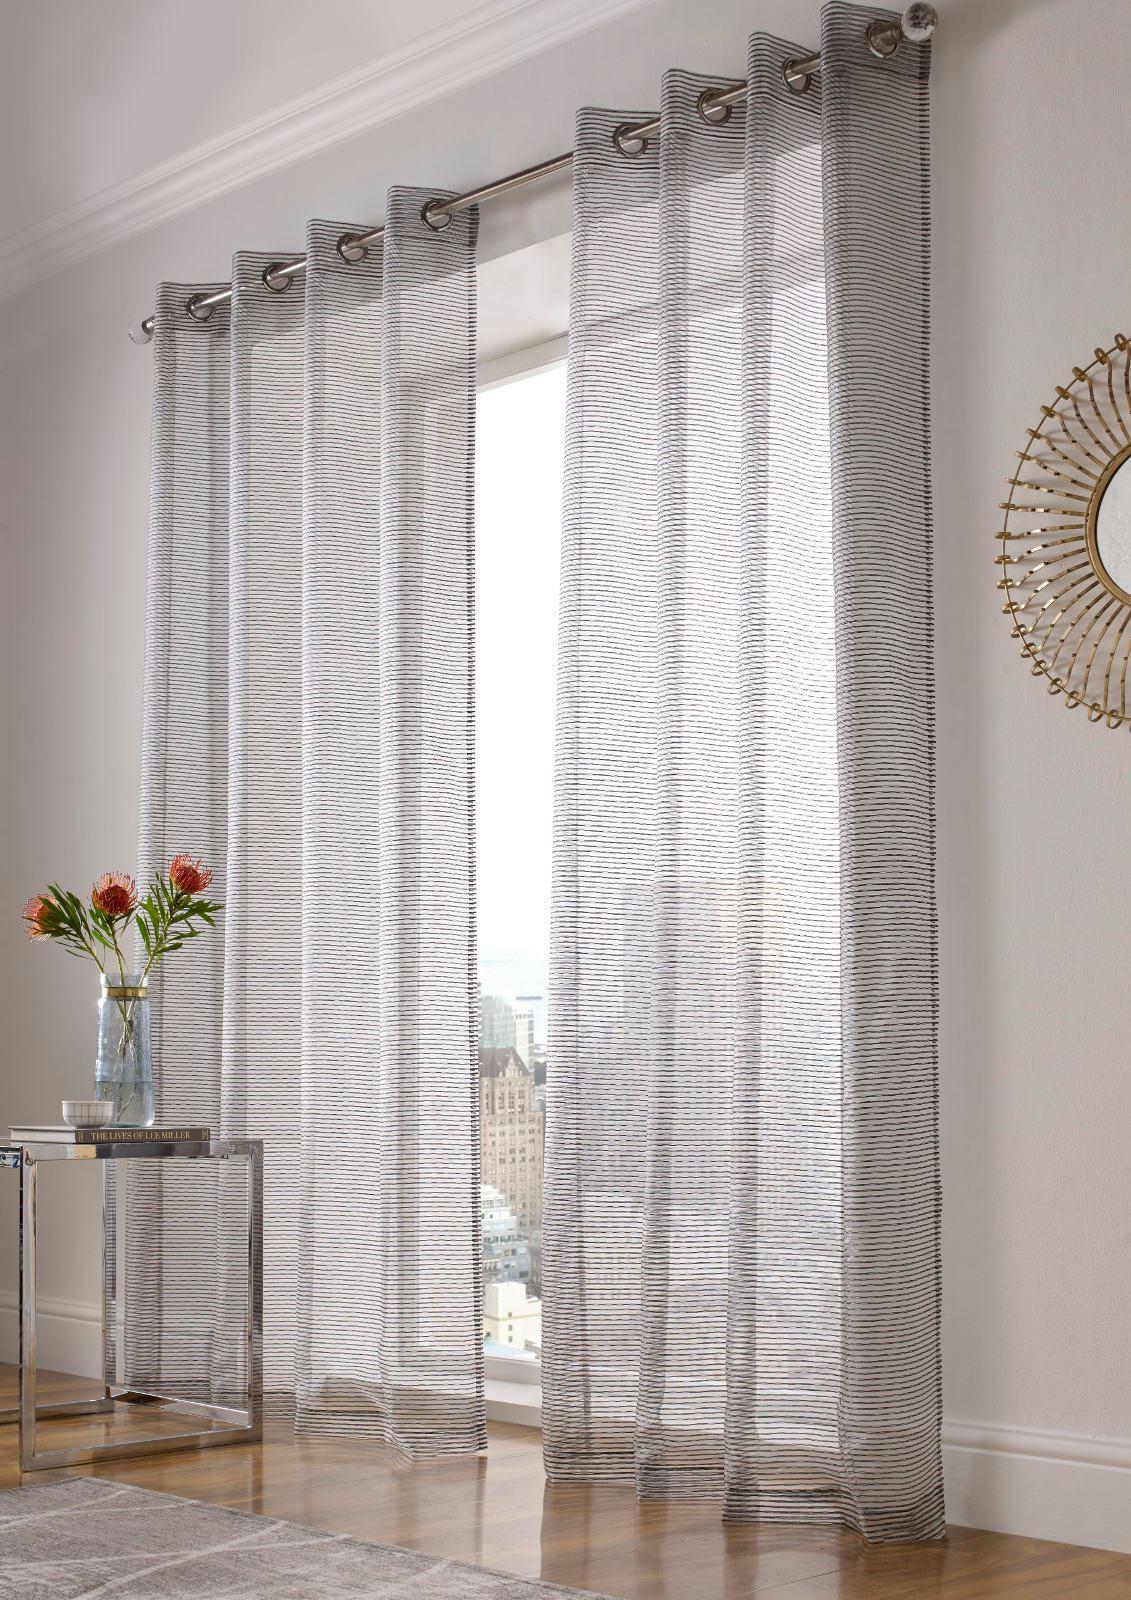 atlanta sparkle stripe eyelet voile curtain bling ready. Black Bedroom Furniture Sets. Home Design Ideas